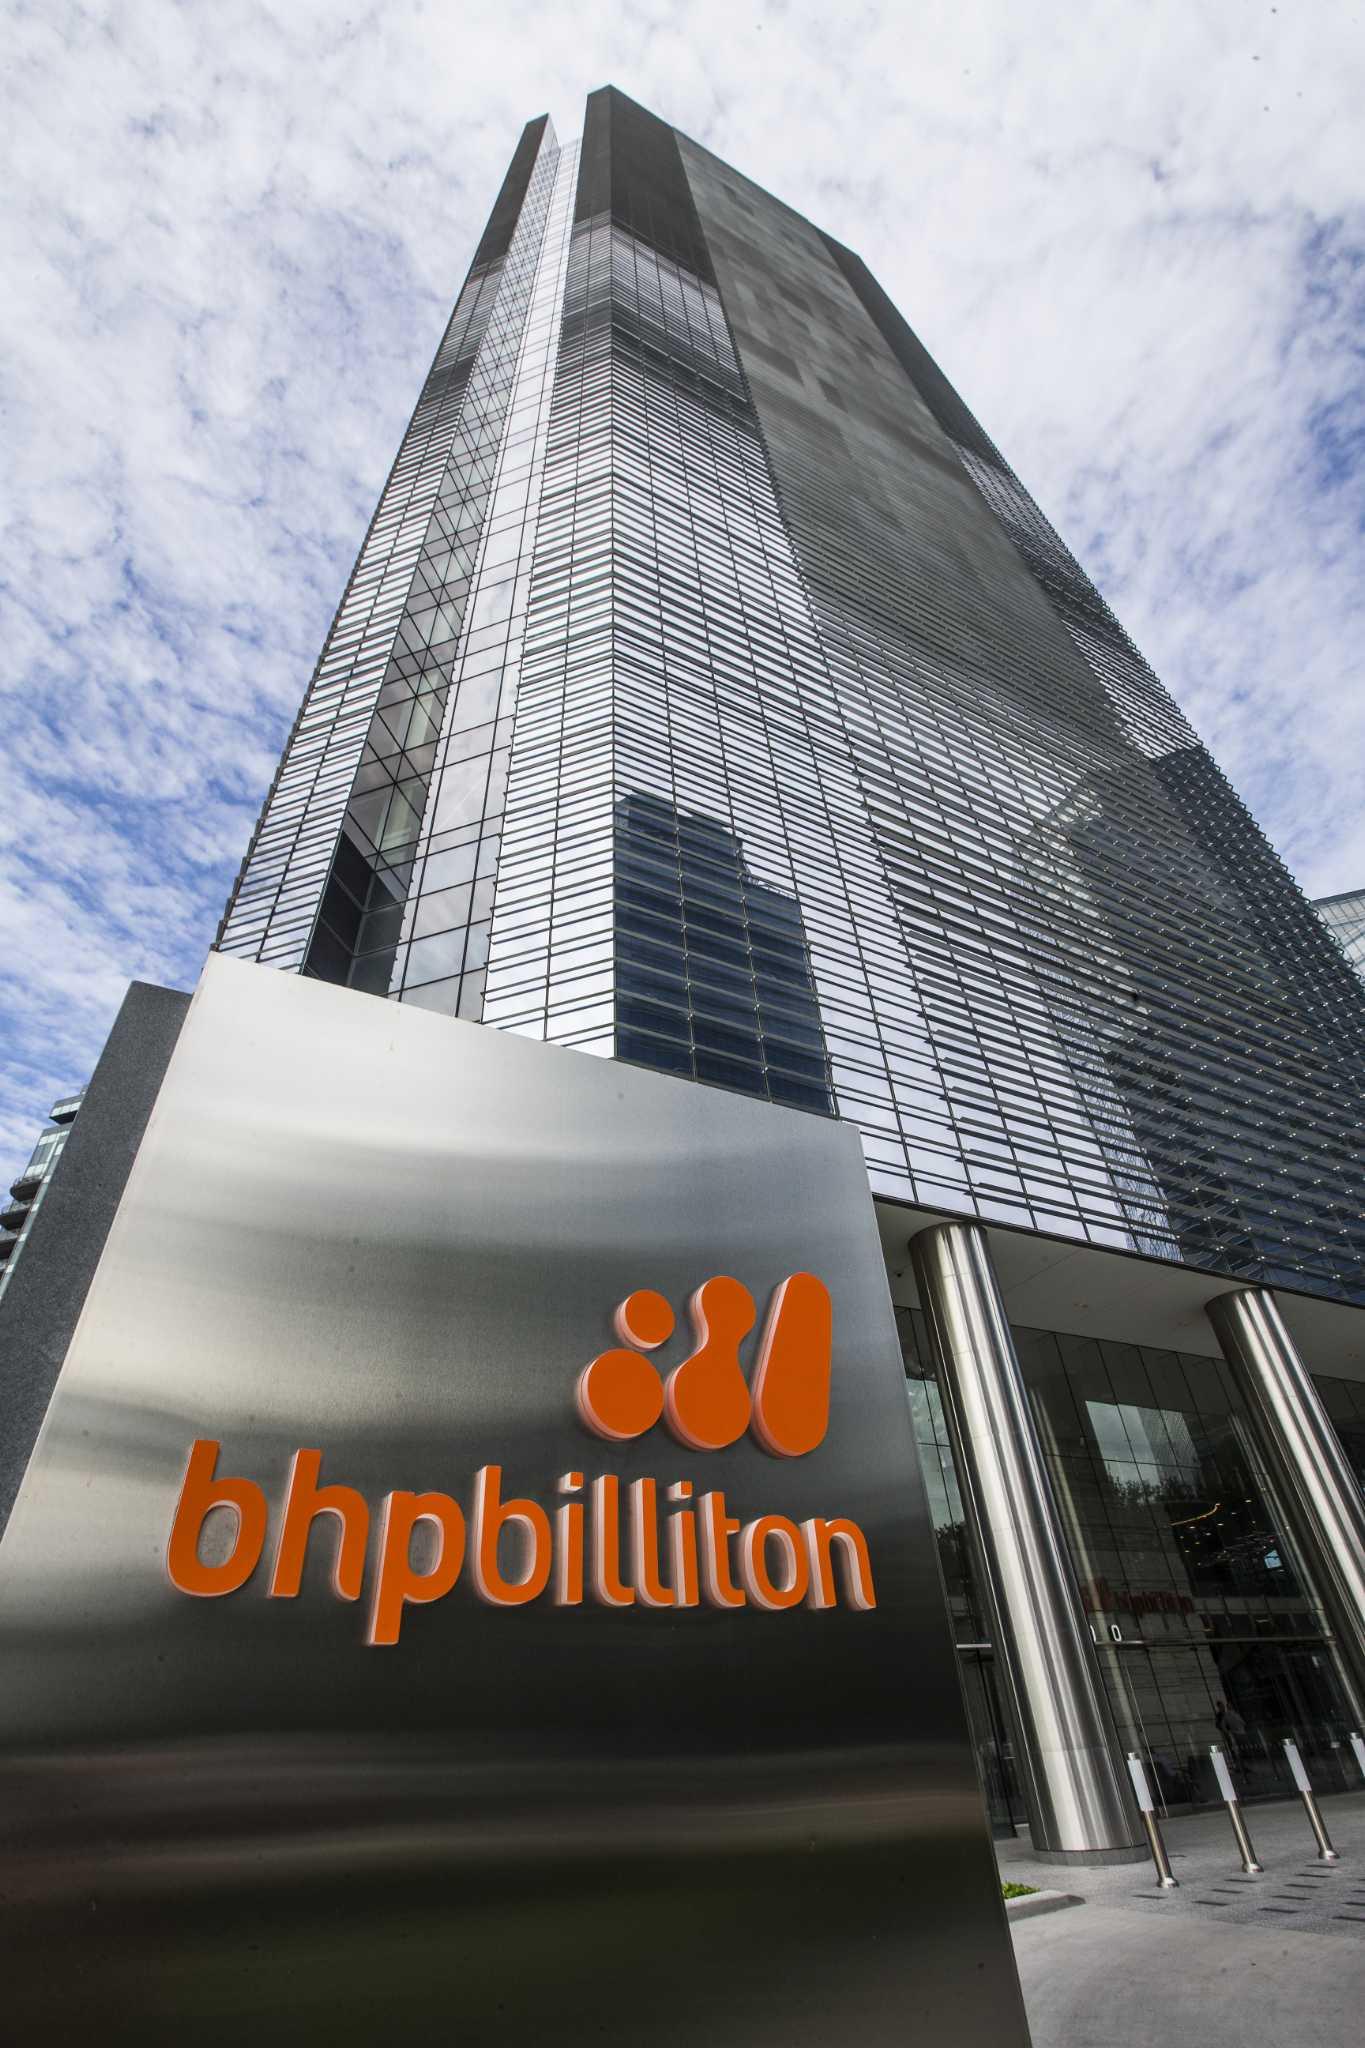 BHP Billiton to sell $10 billion in U.S. shale plays ...